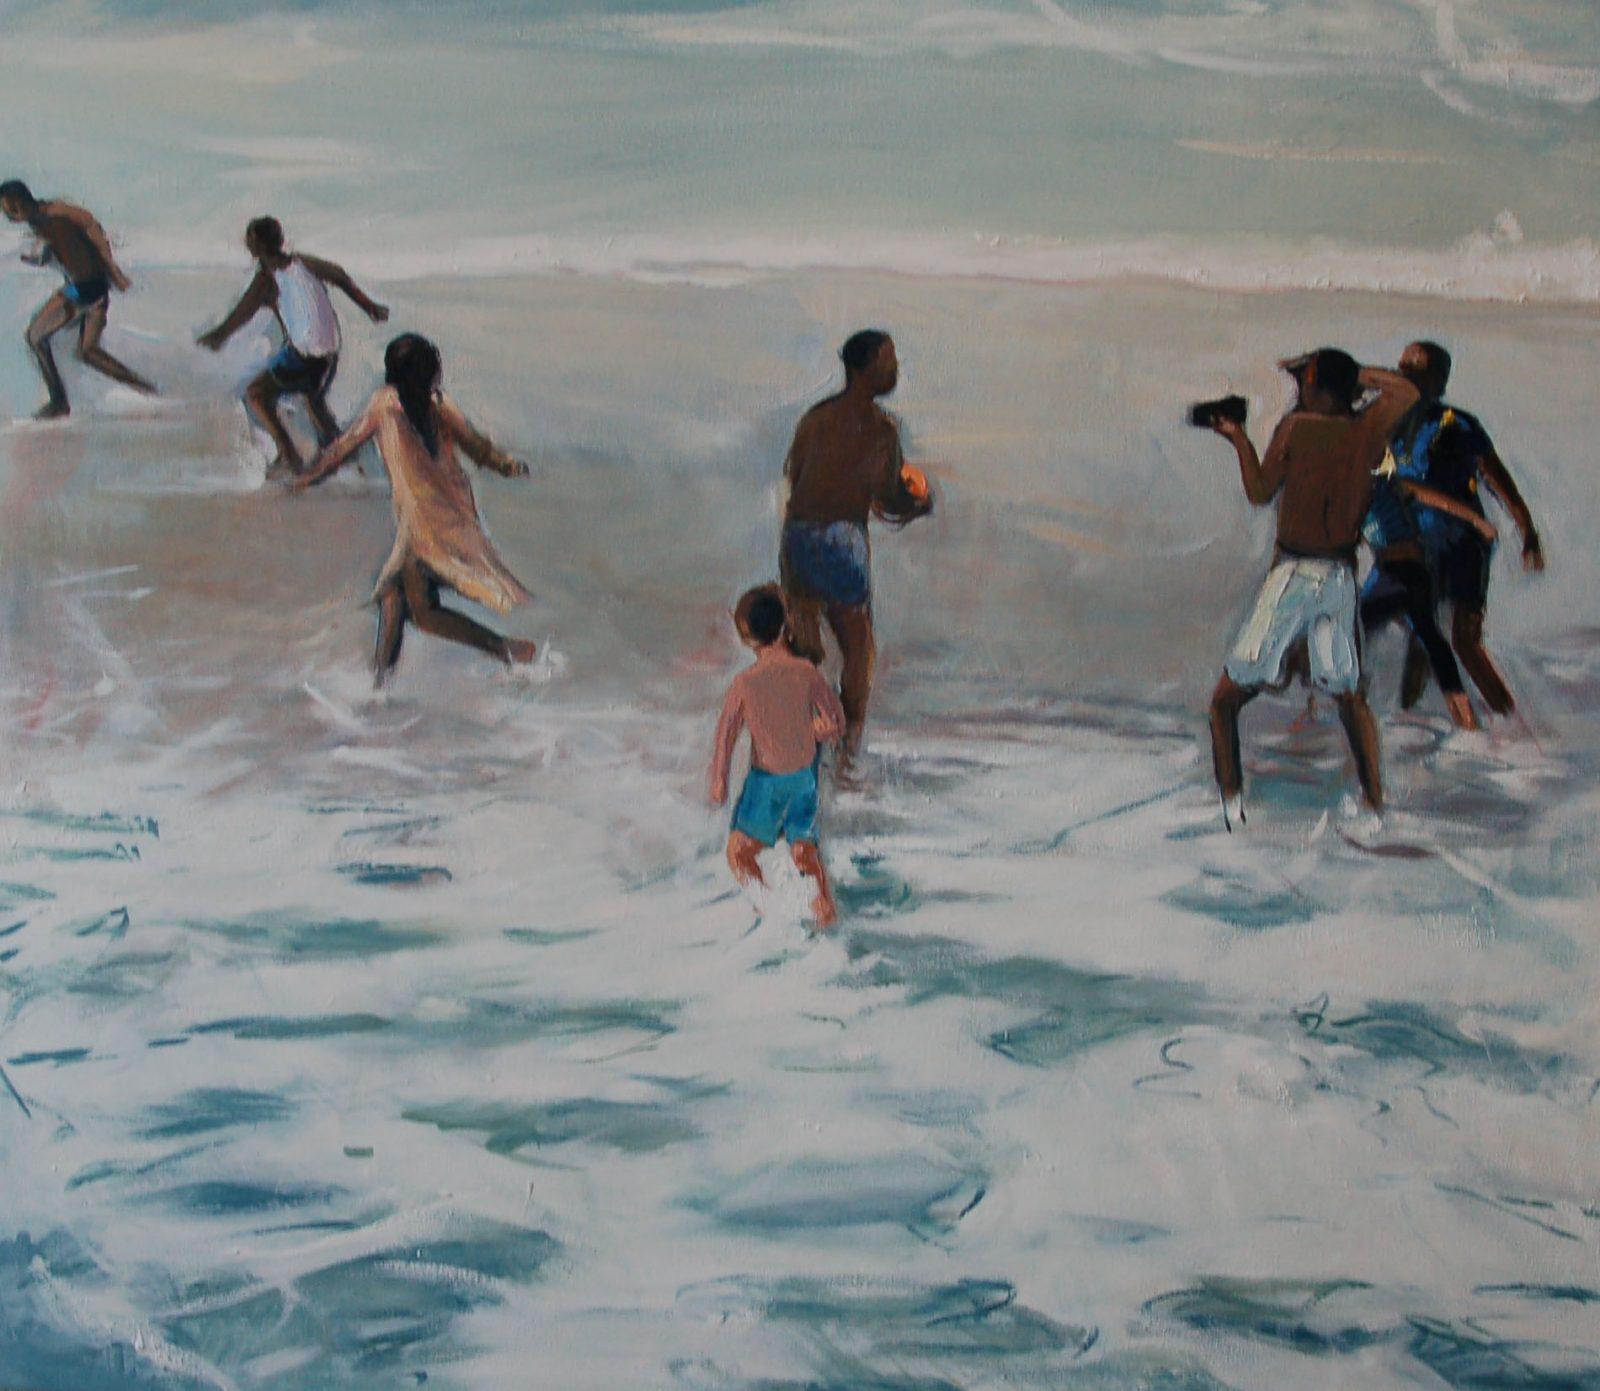 Yolanda encabo, Impuls (Ausschnitt), Öl auf Leinwand, 95 x 110 cm